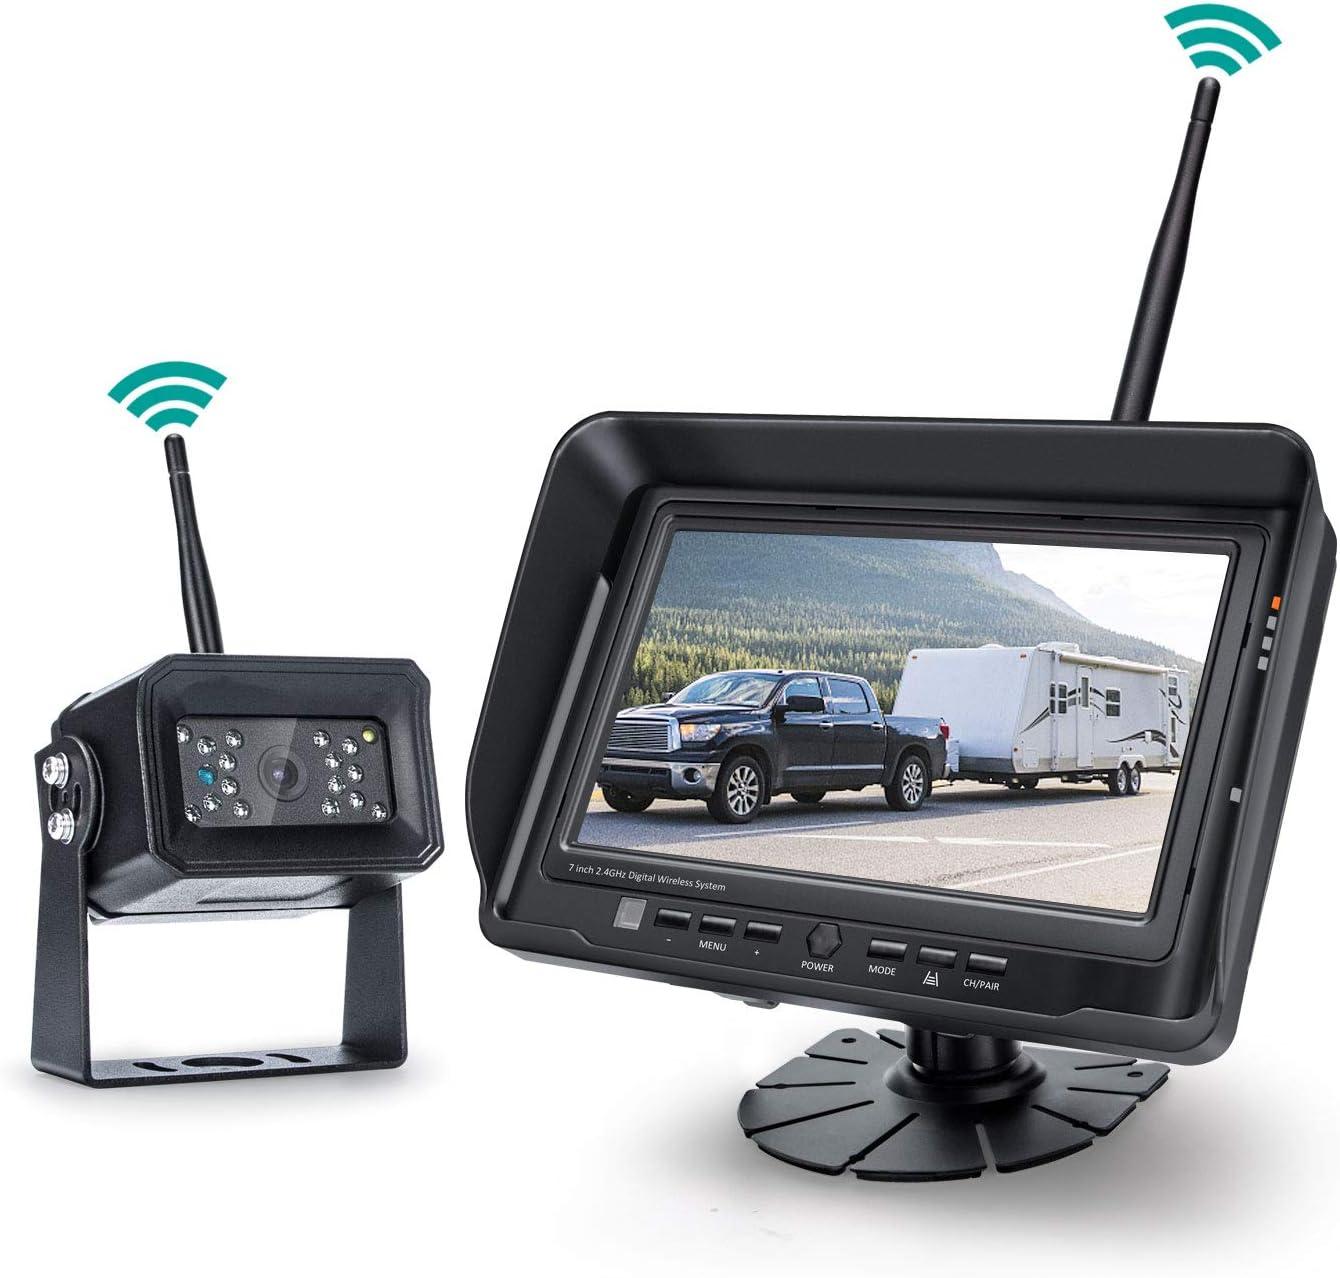 Digital Wireless Backup Camera System, No Interference, IP69k Waterproof Wireless Rear View Camera, 7'' Display Wireless Reverse Monitor for RV/Truck/Trailer/Bus/Motorhome/5th Wheel/Pickup/Van